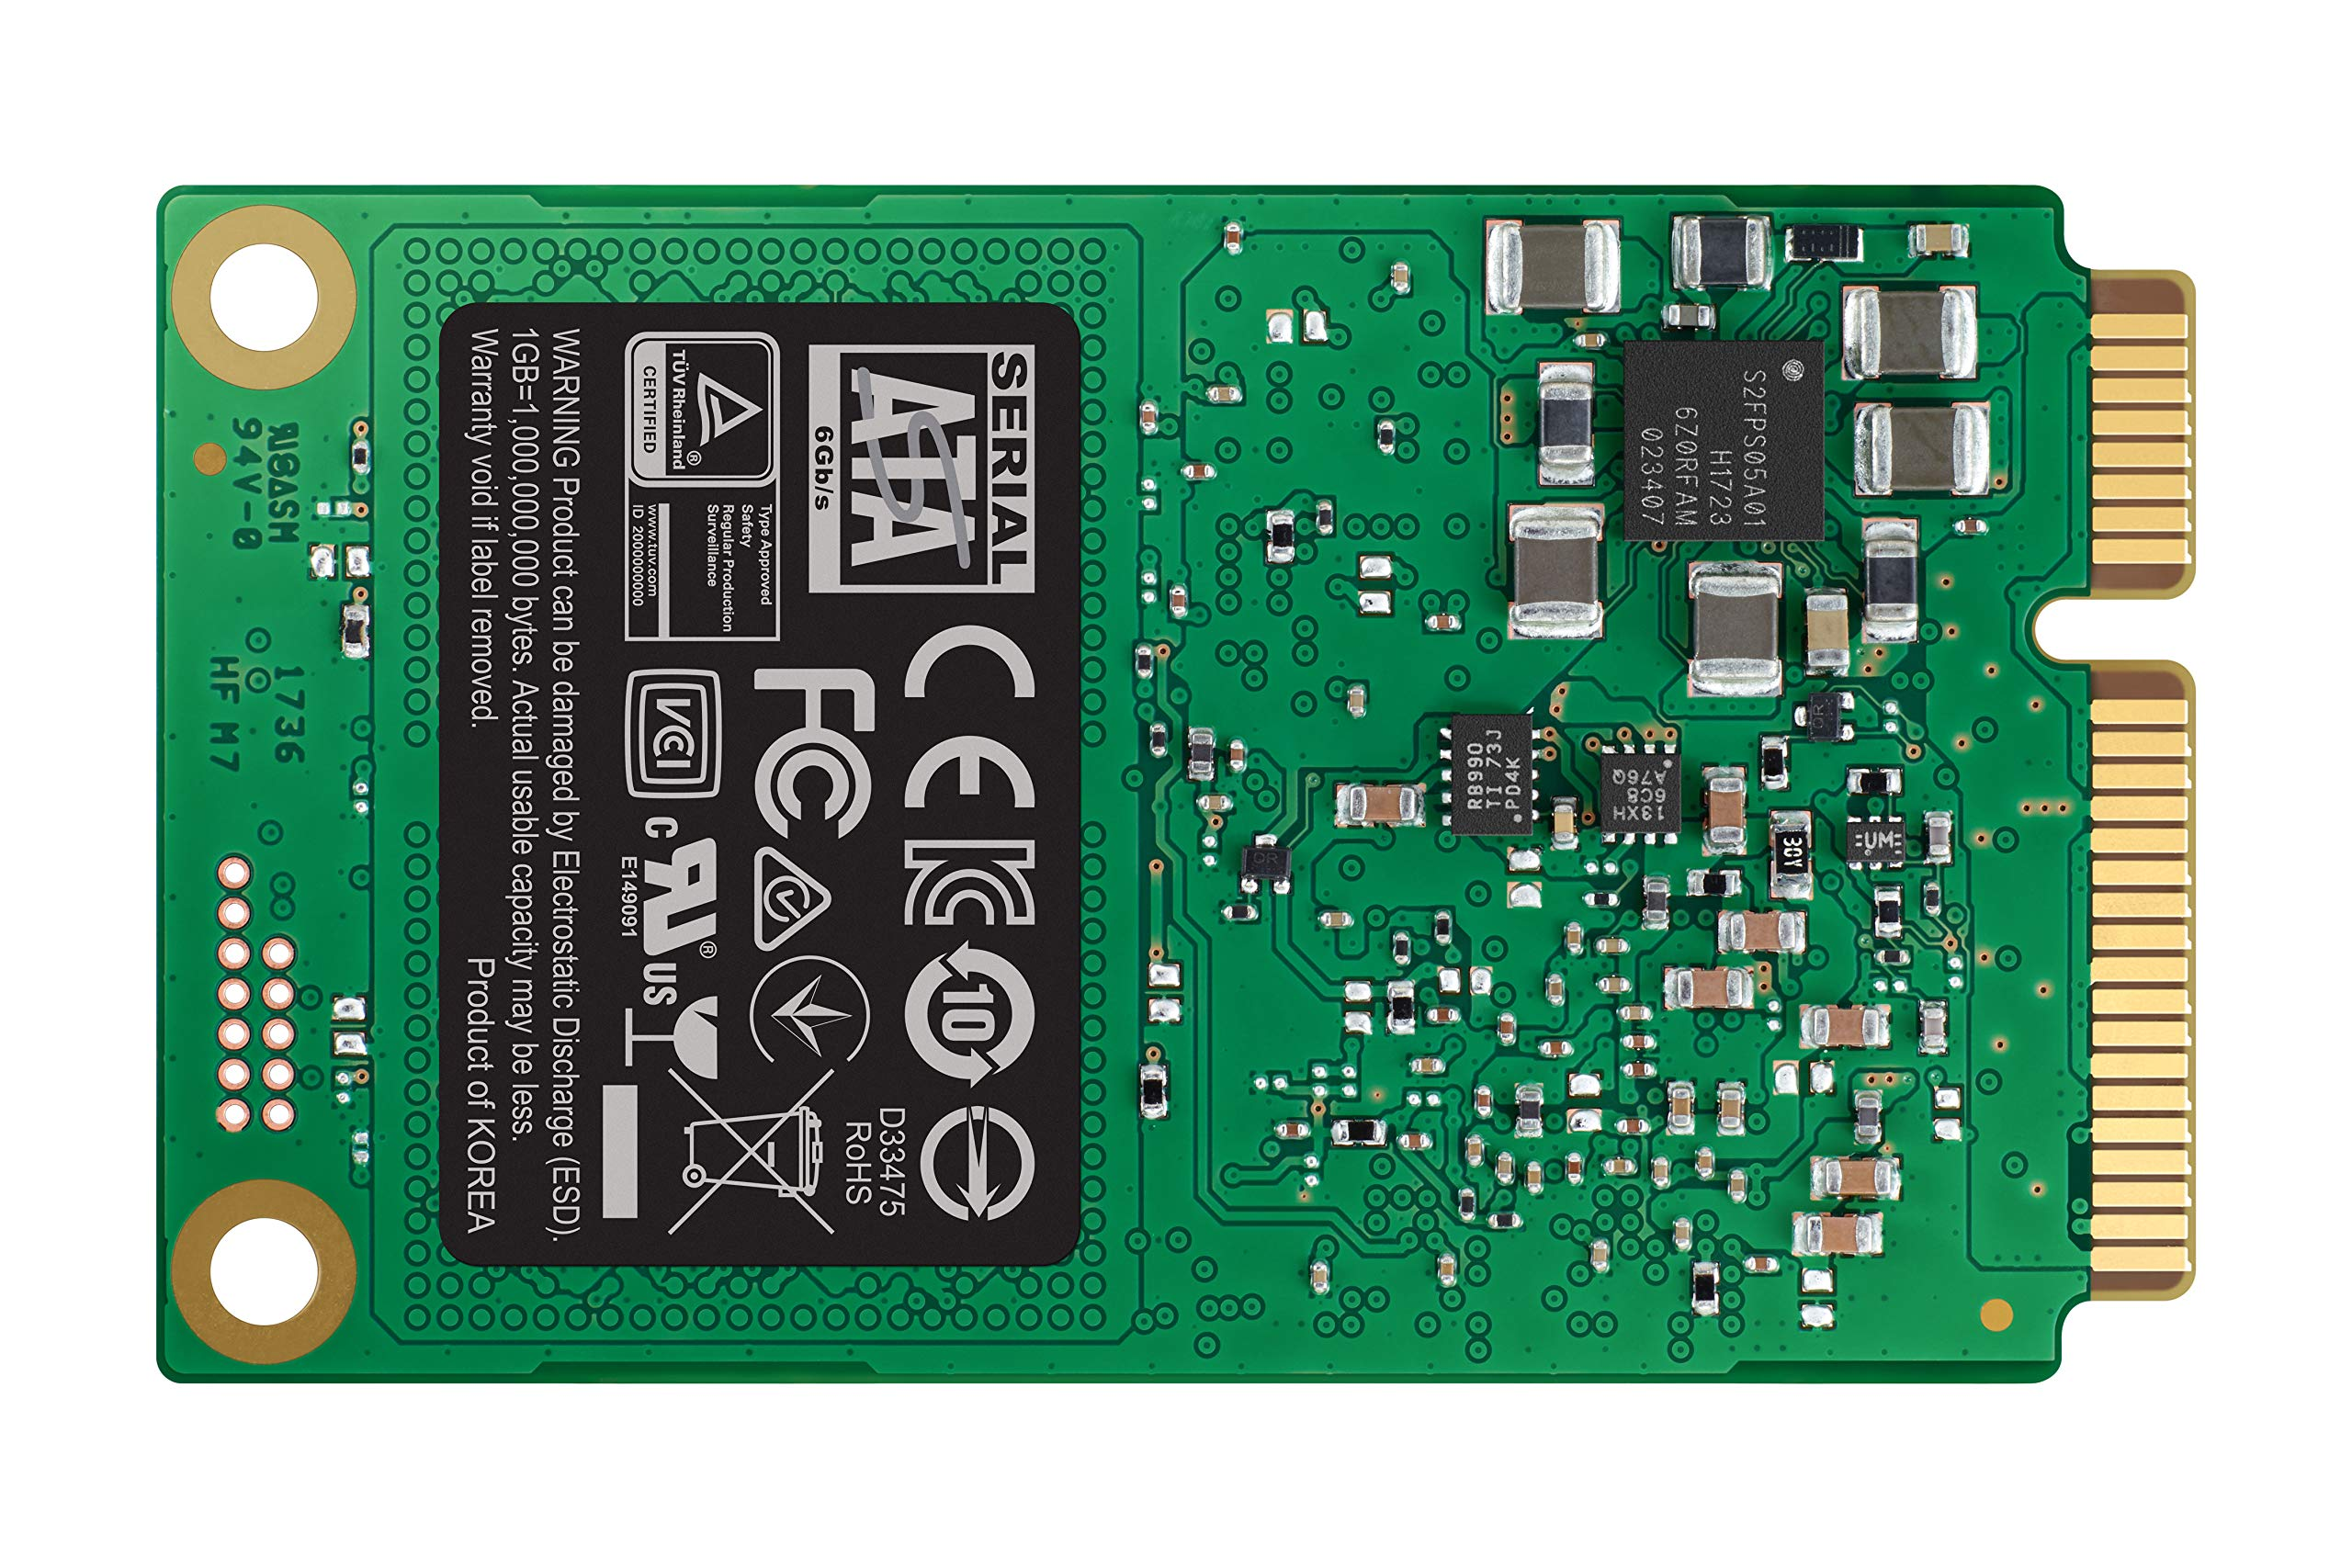 Samsung SSD 860 EVO 1TB mSATA Internal SSD (MZ-M6E1T0BW) by Samsung (Image #13)